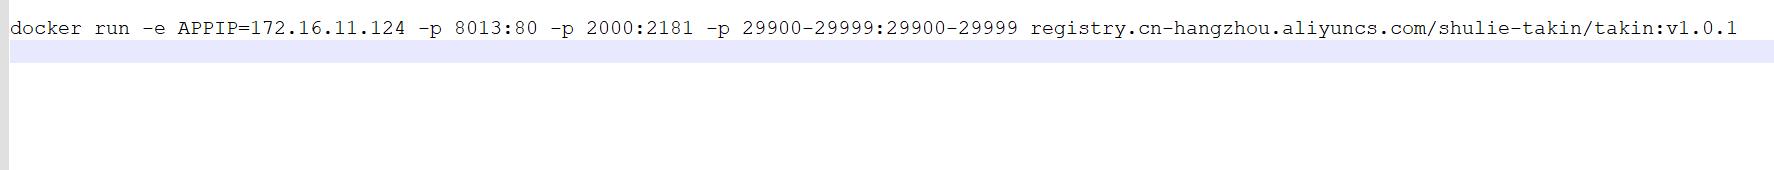 16329052561